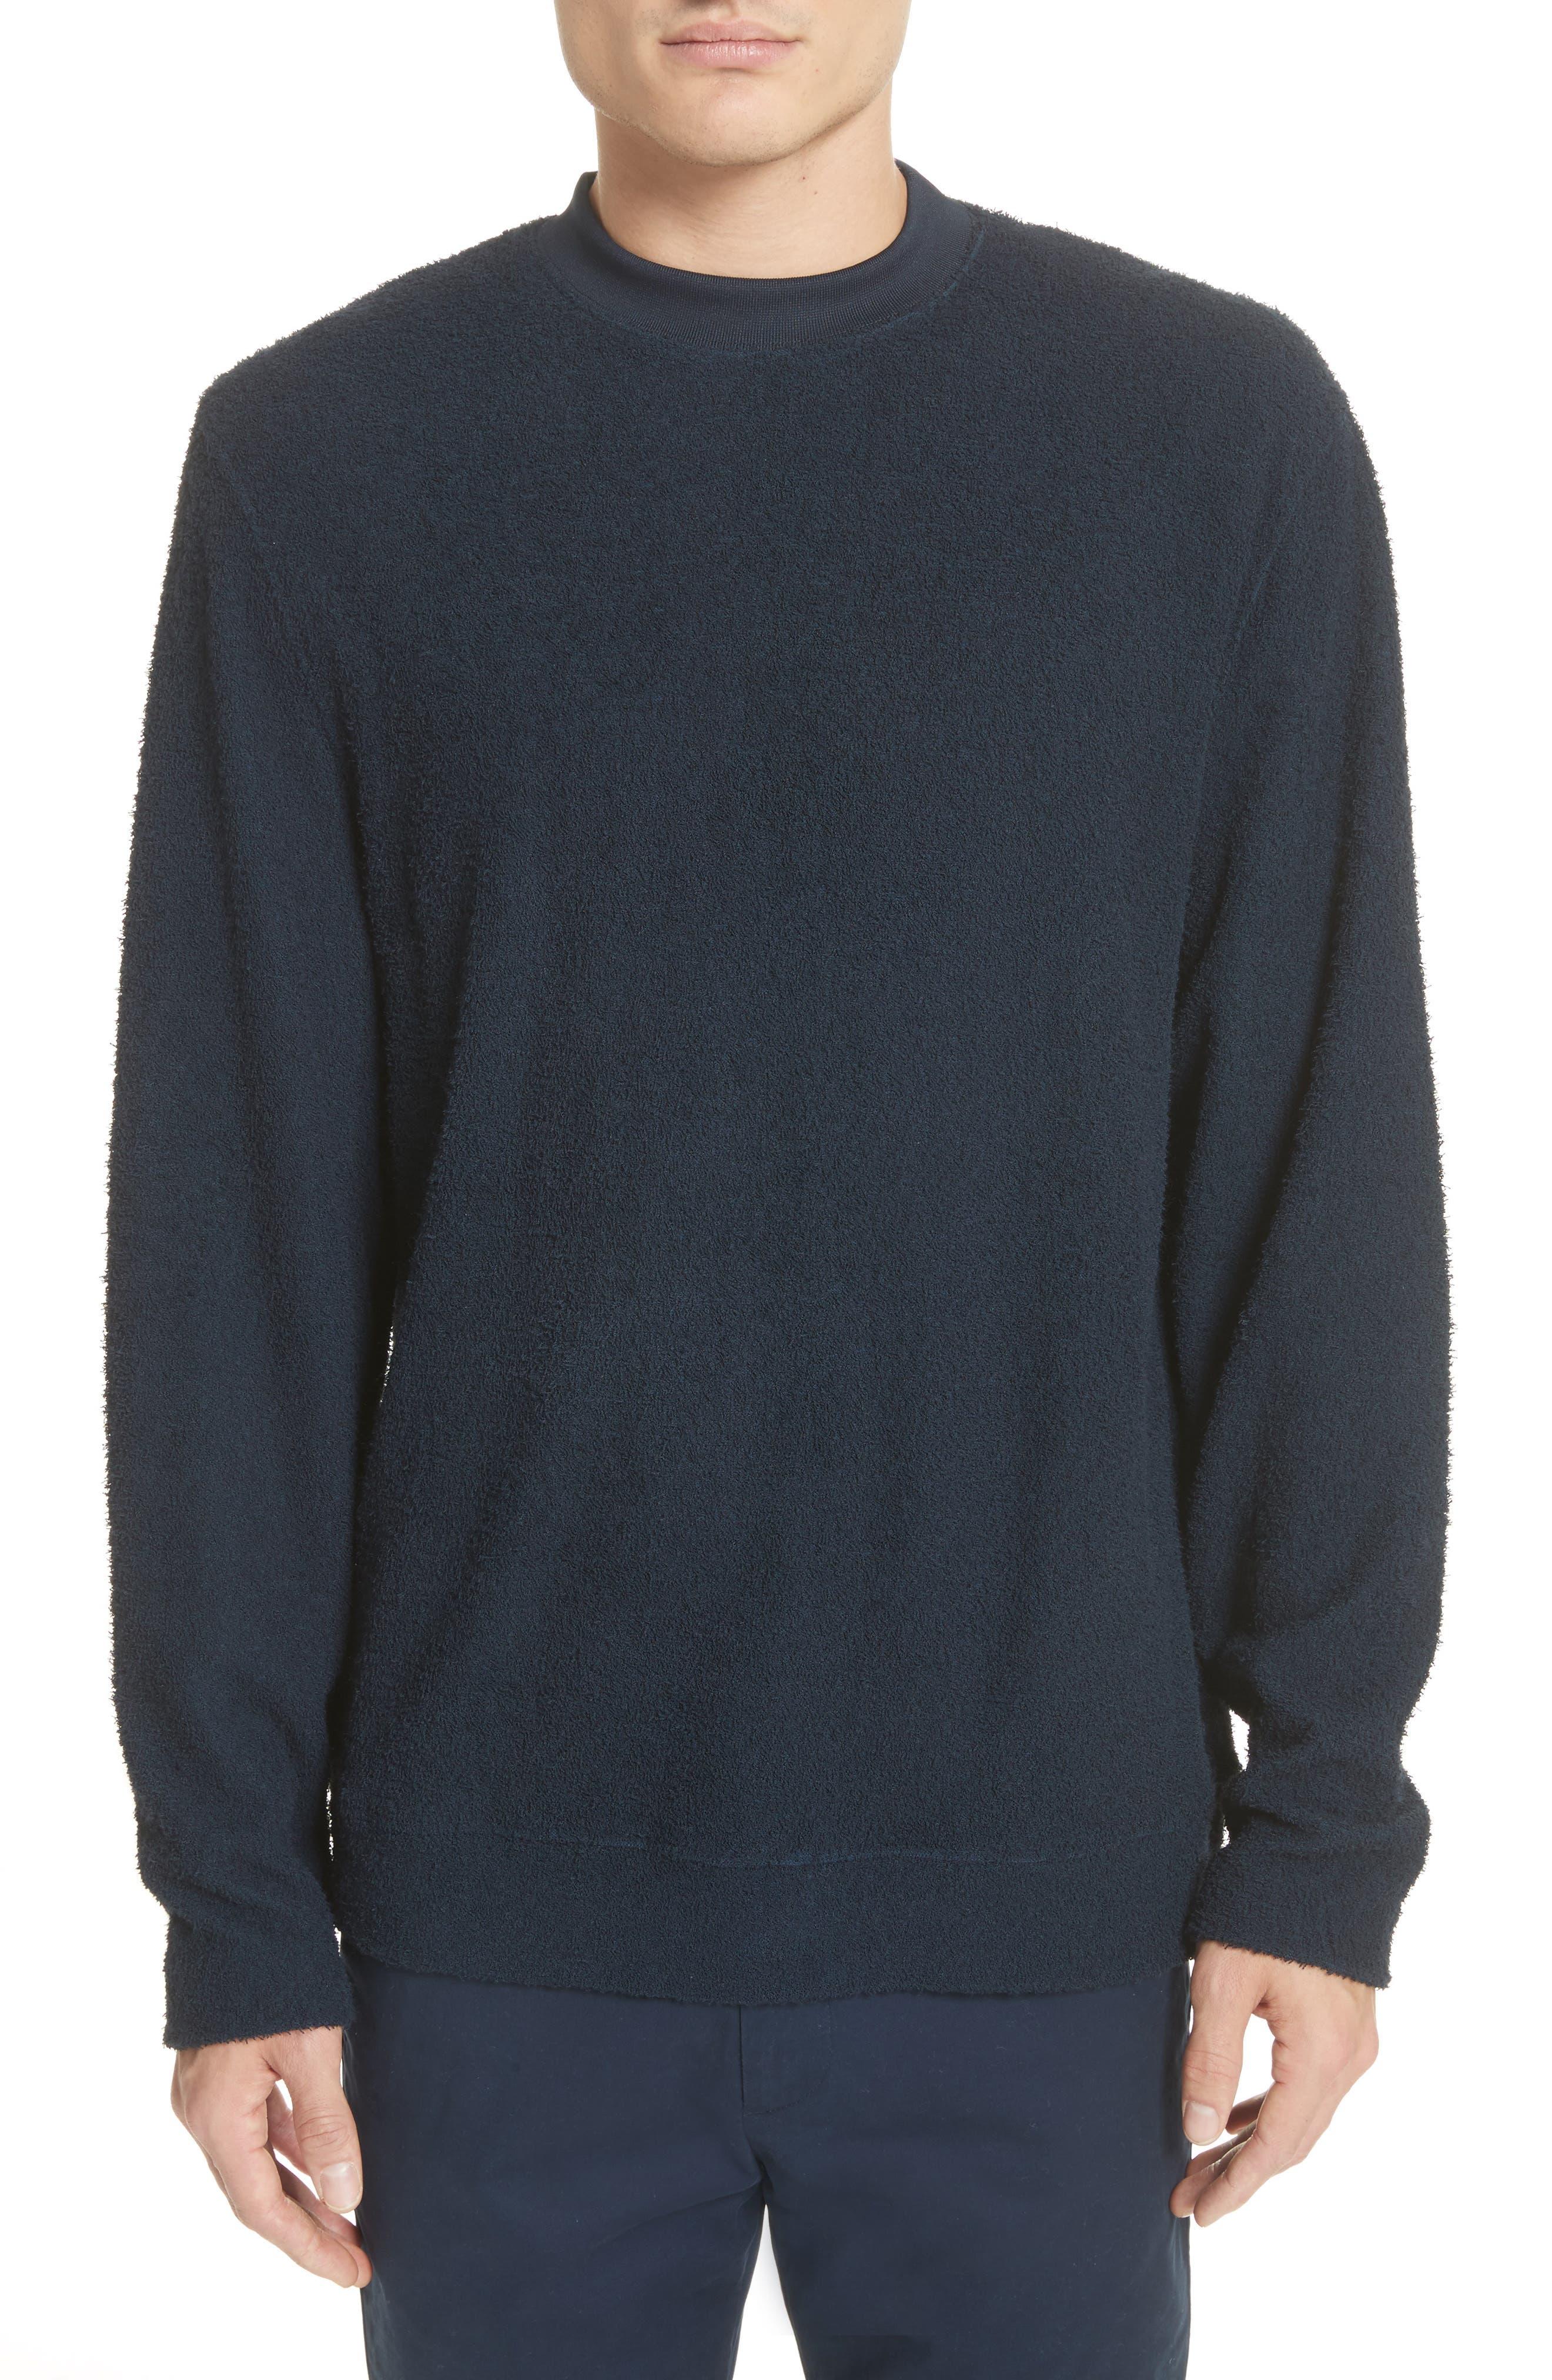 Rask Crewneck Sweatshirt,                         Main,                         color, 410